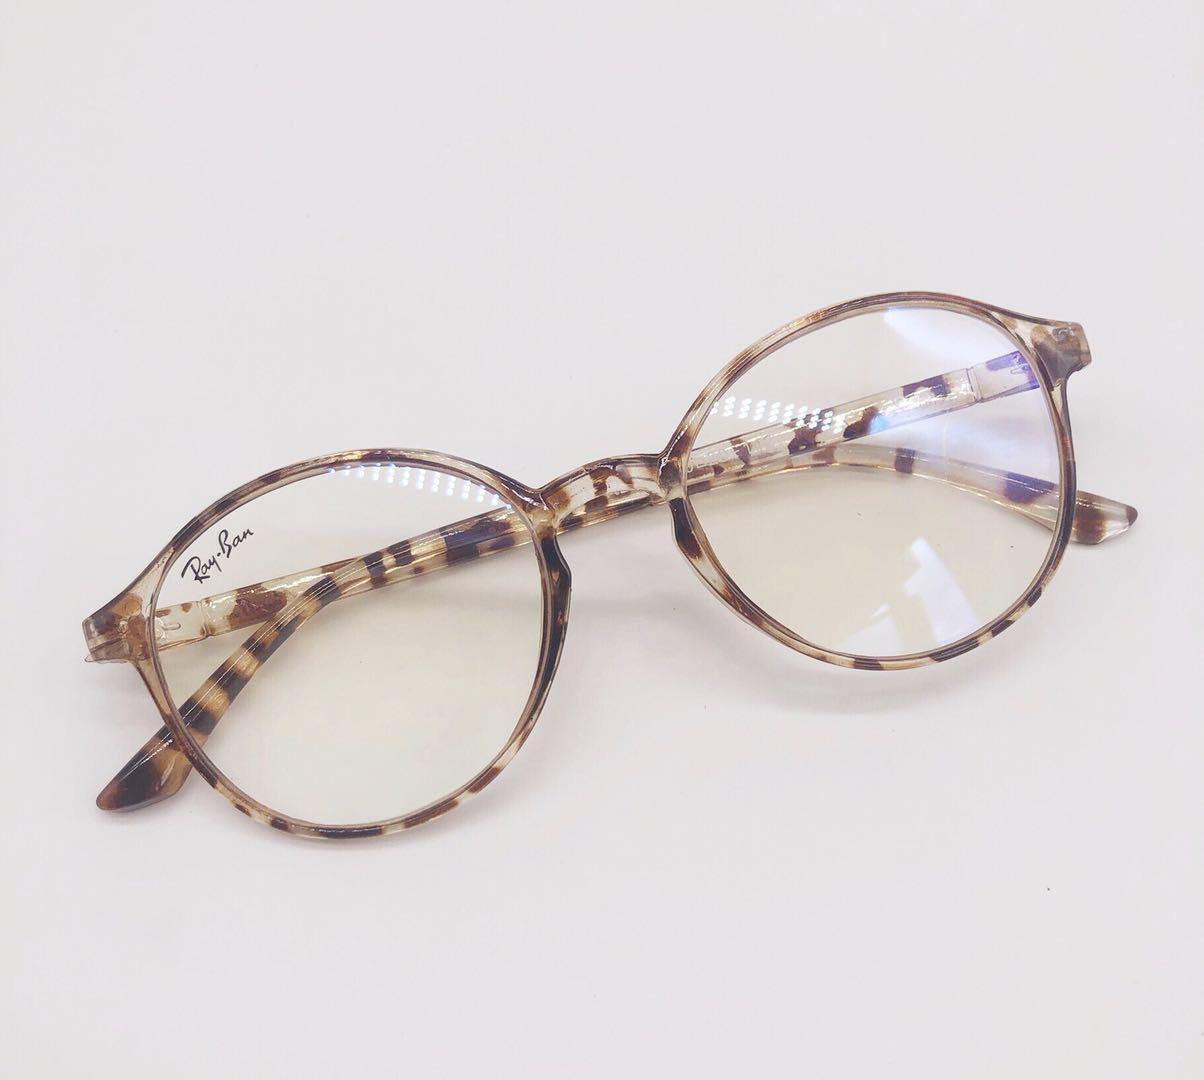 2f09a69f2 Sunglasses For Women for sale - Womens Sunglasses Online Deals ...